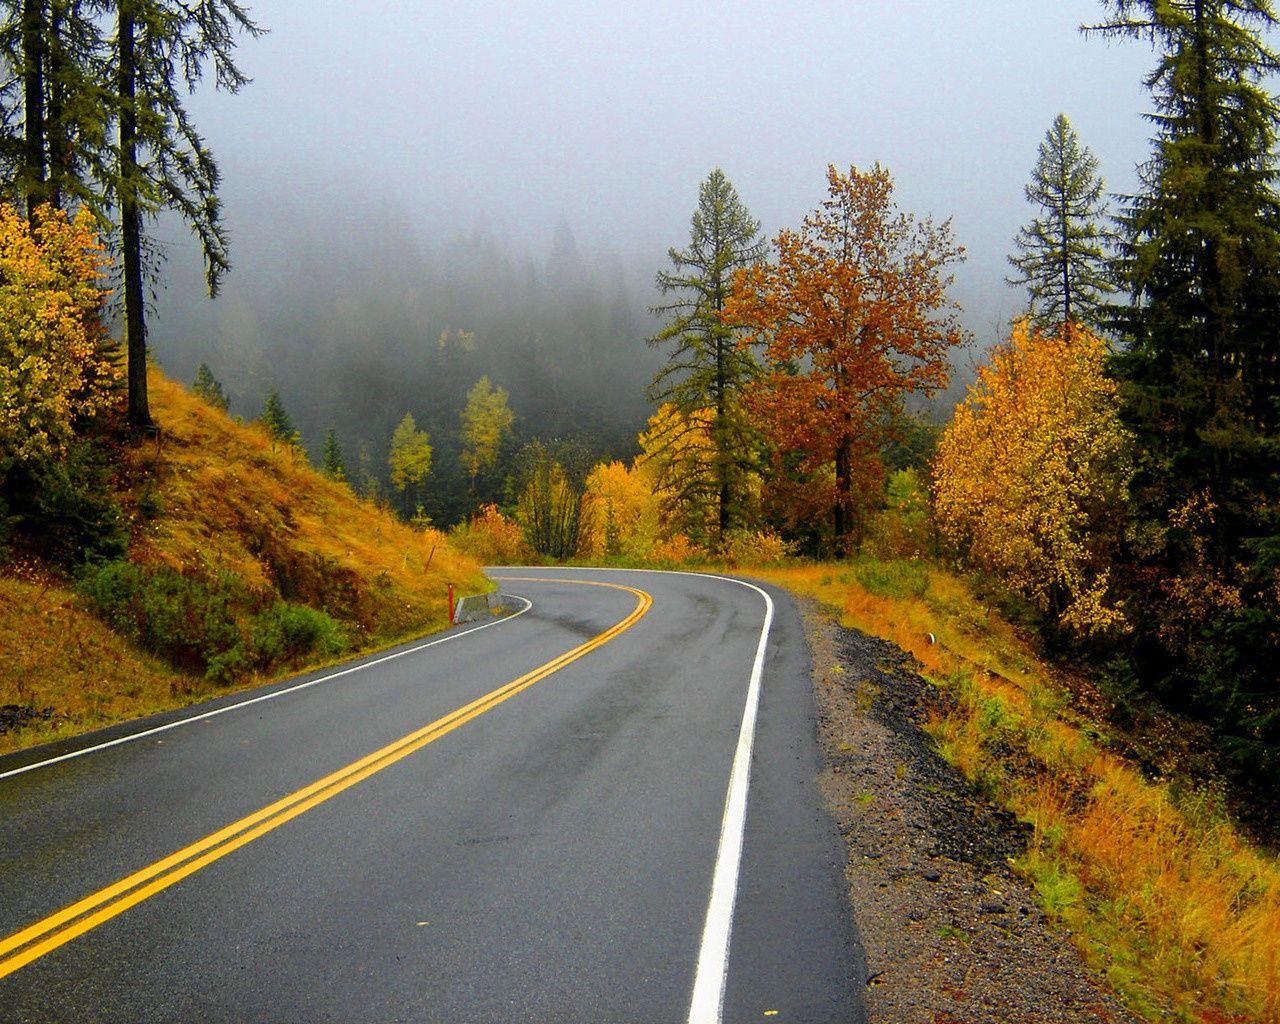 #ridecolorfully - Mountain Road